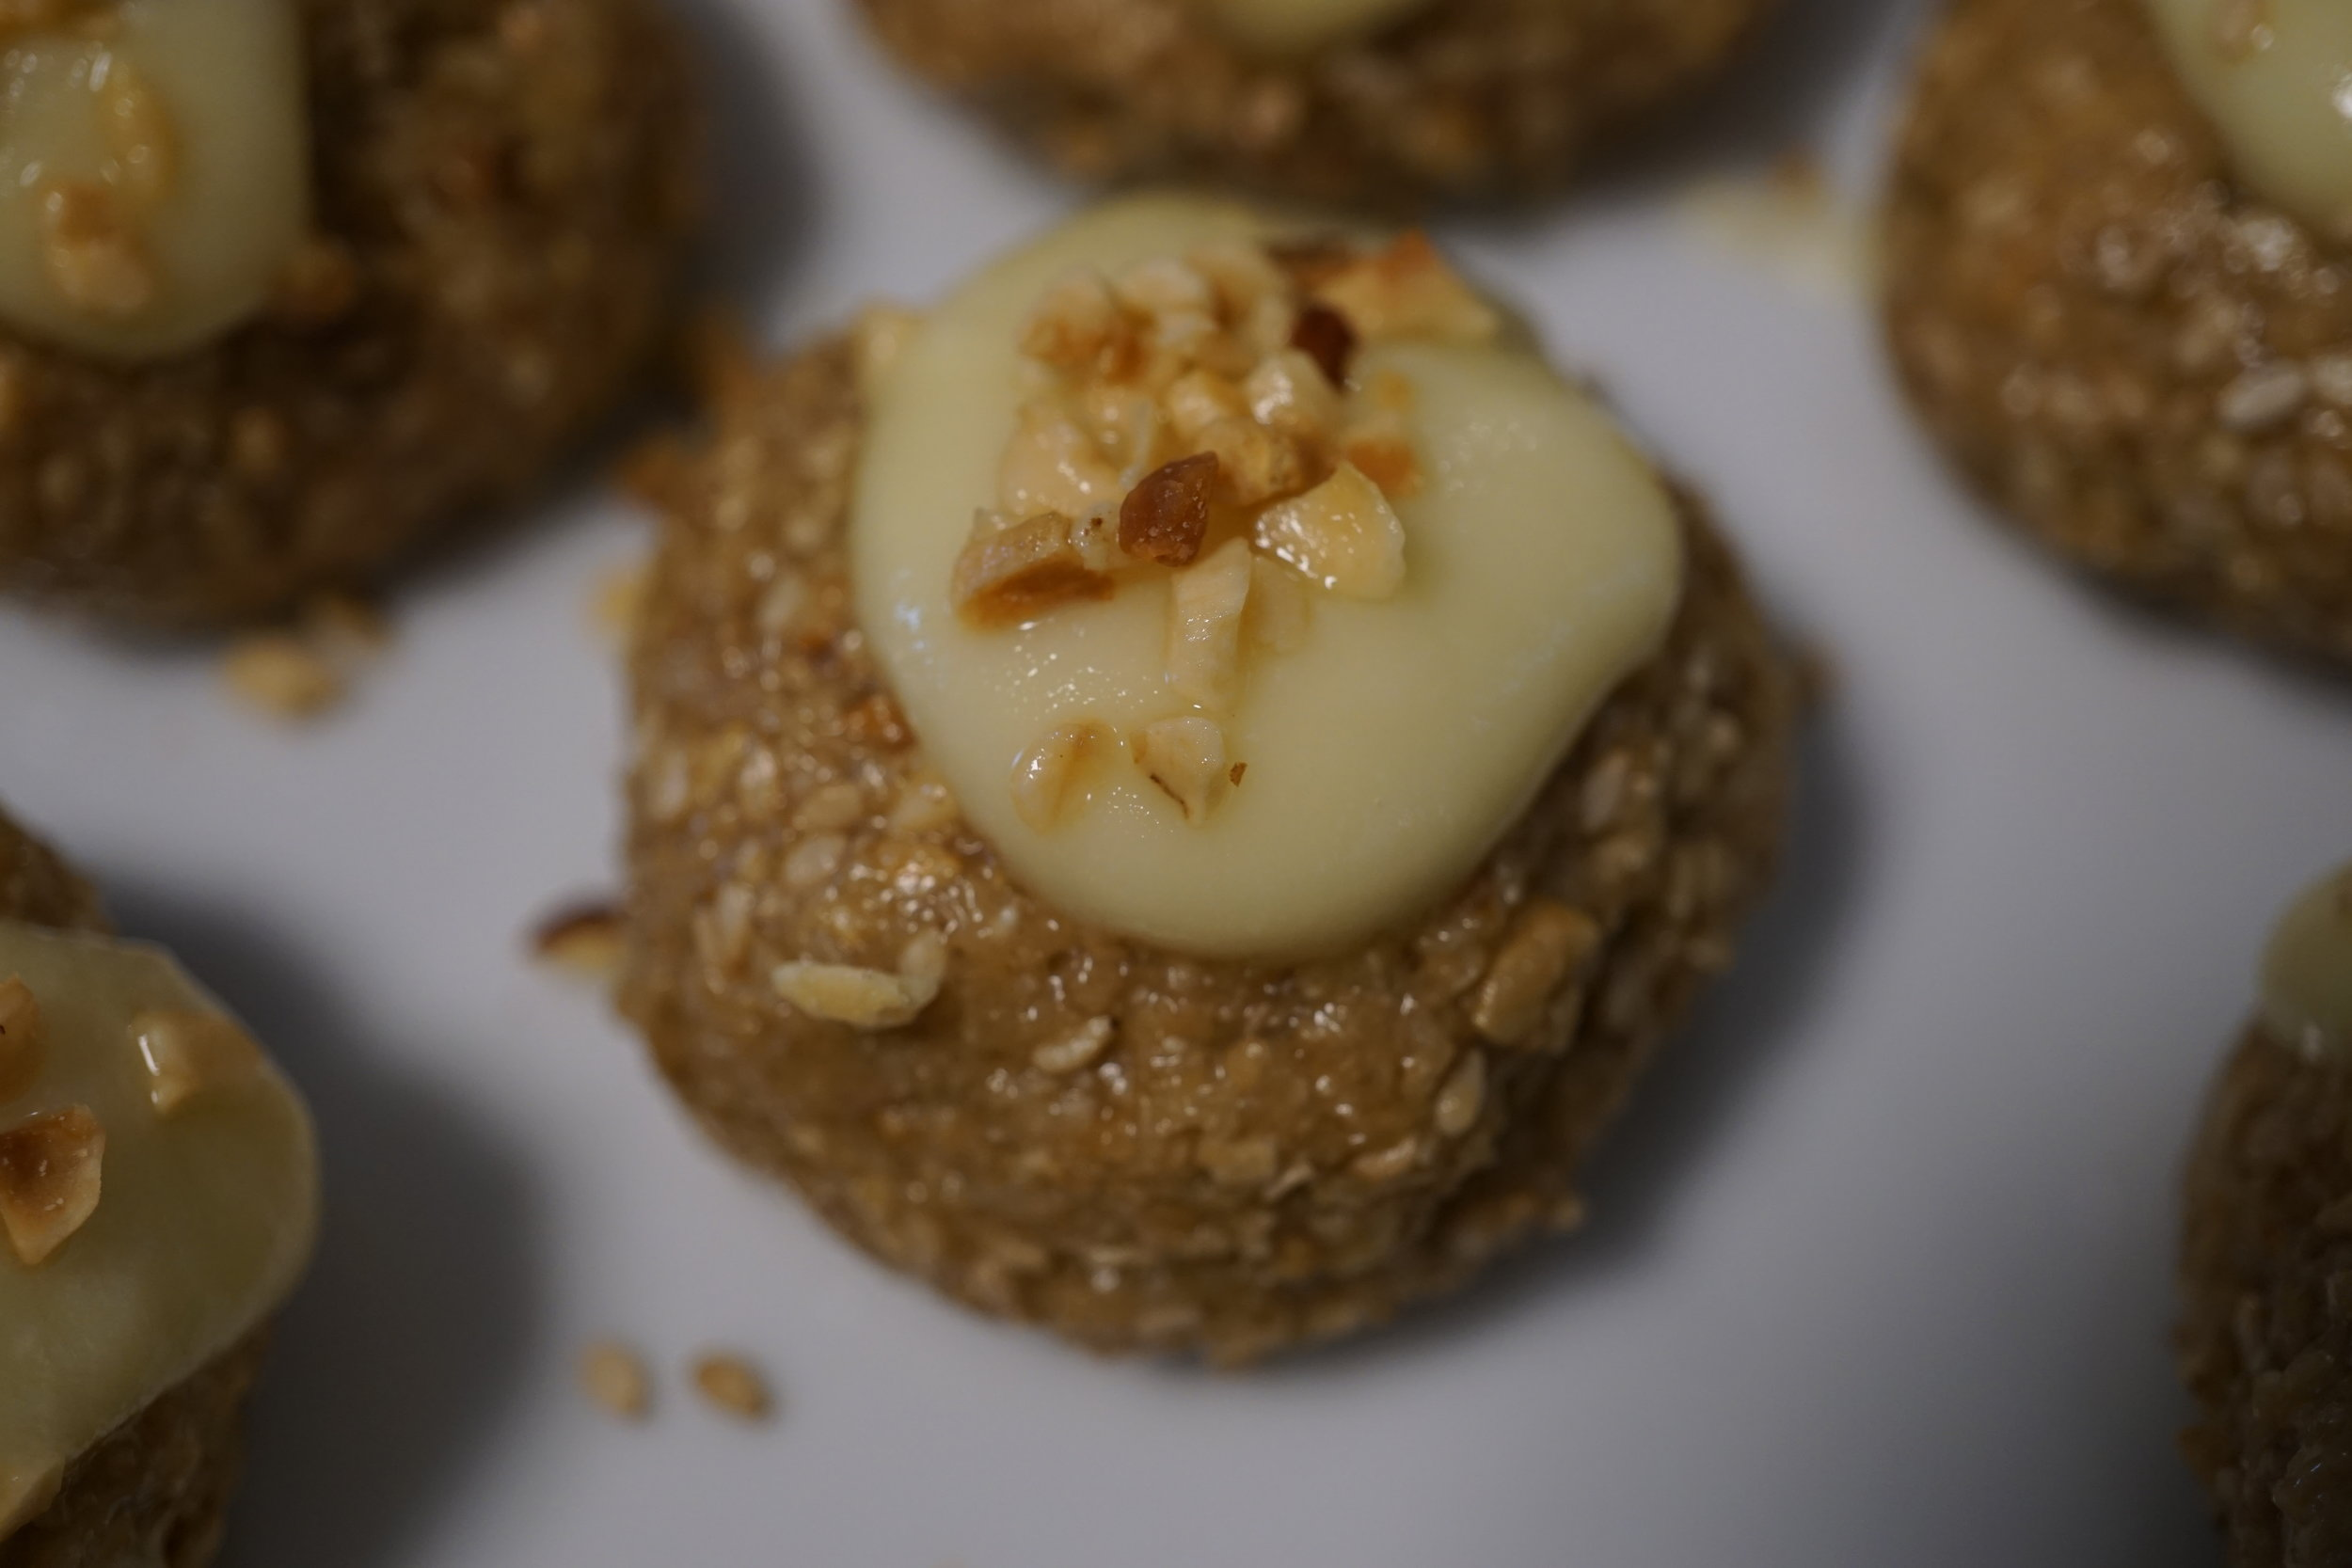 White lemon dröm chokladbollar - the recipe is in my  book!